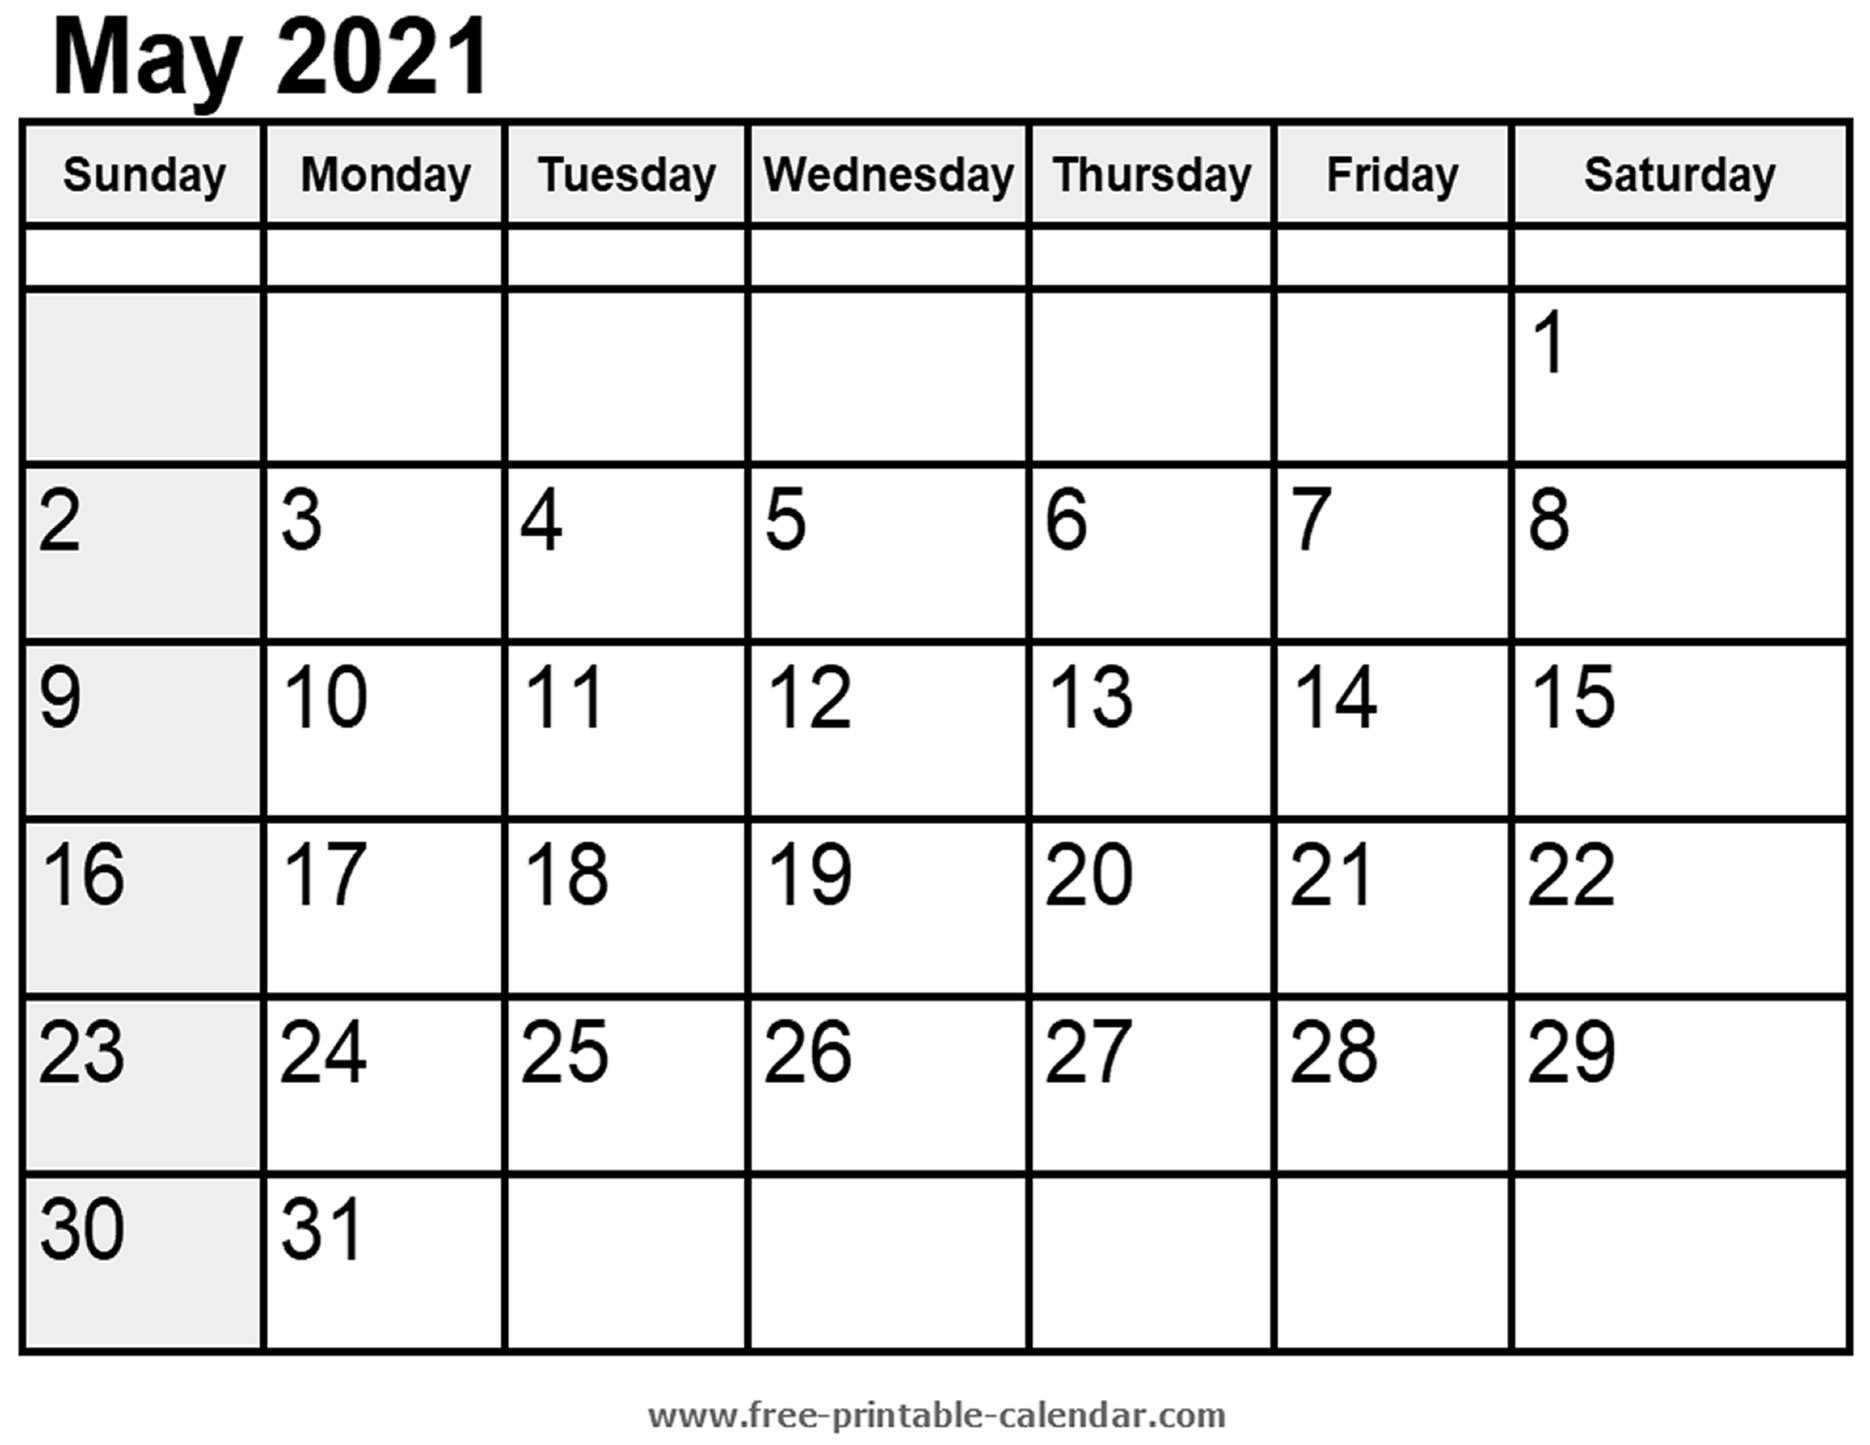 Calendar May 2021 Free Printable Calendar